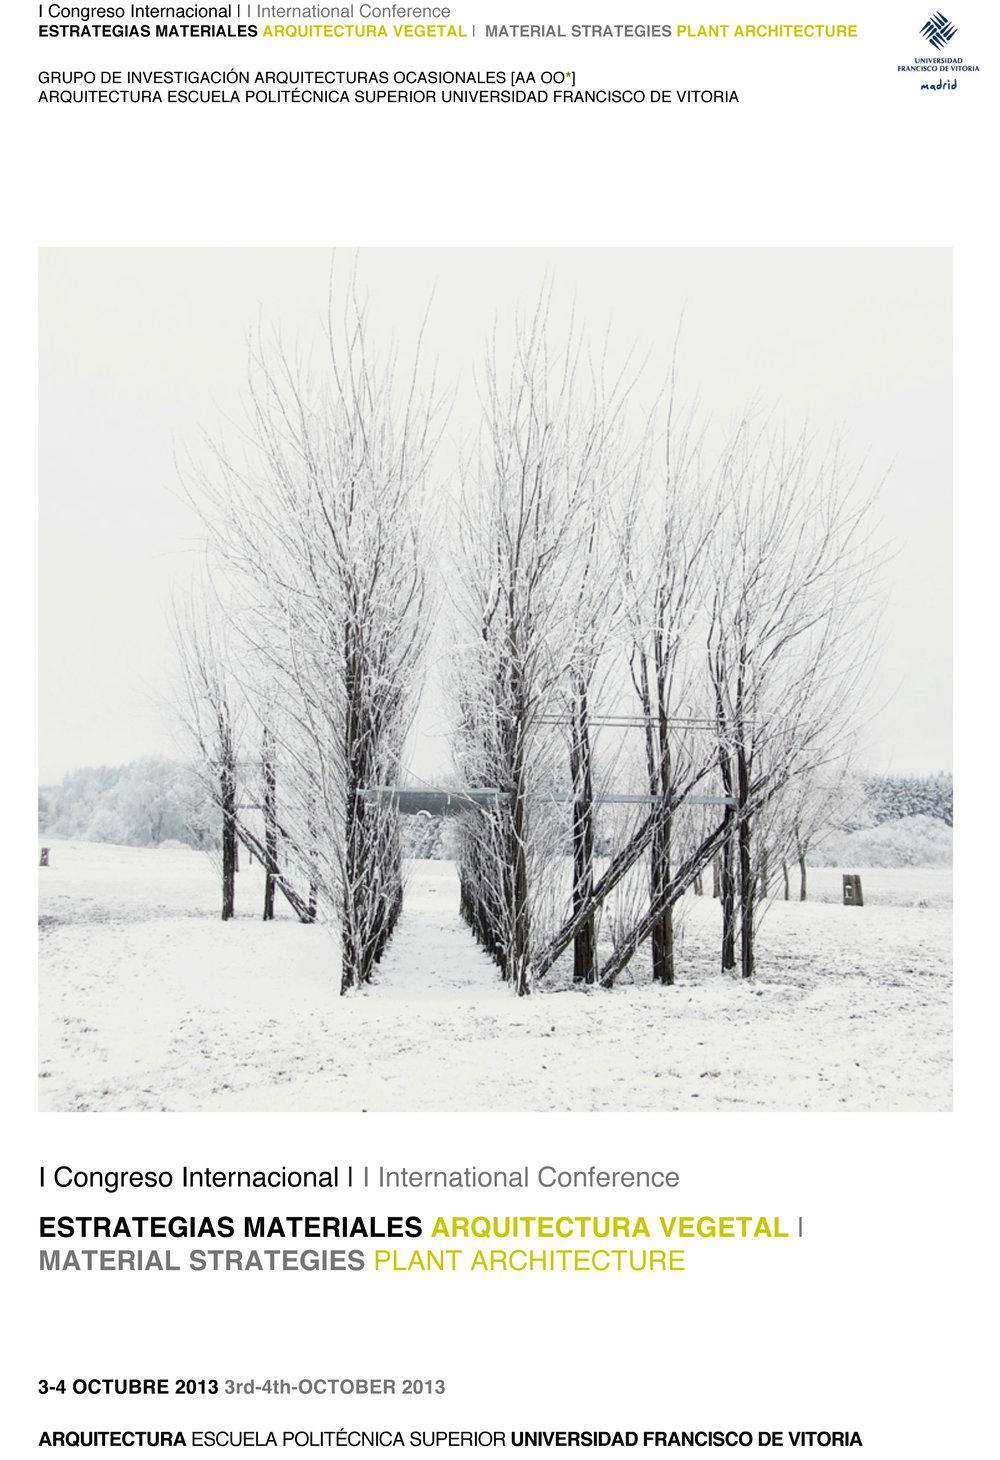 130925_Programa_Arquitectura Vegetal_Plant Building Conference[1]-1.jpg